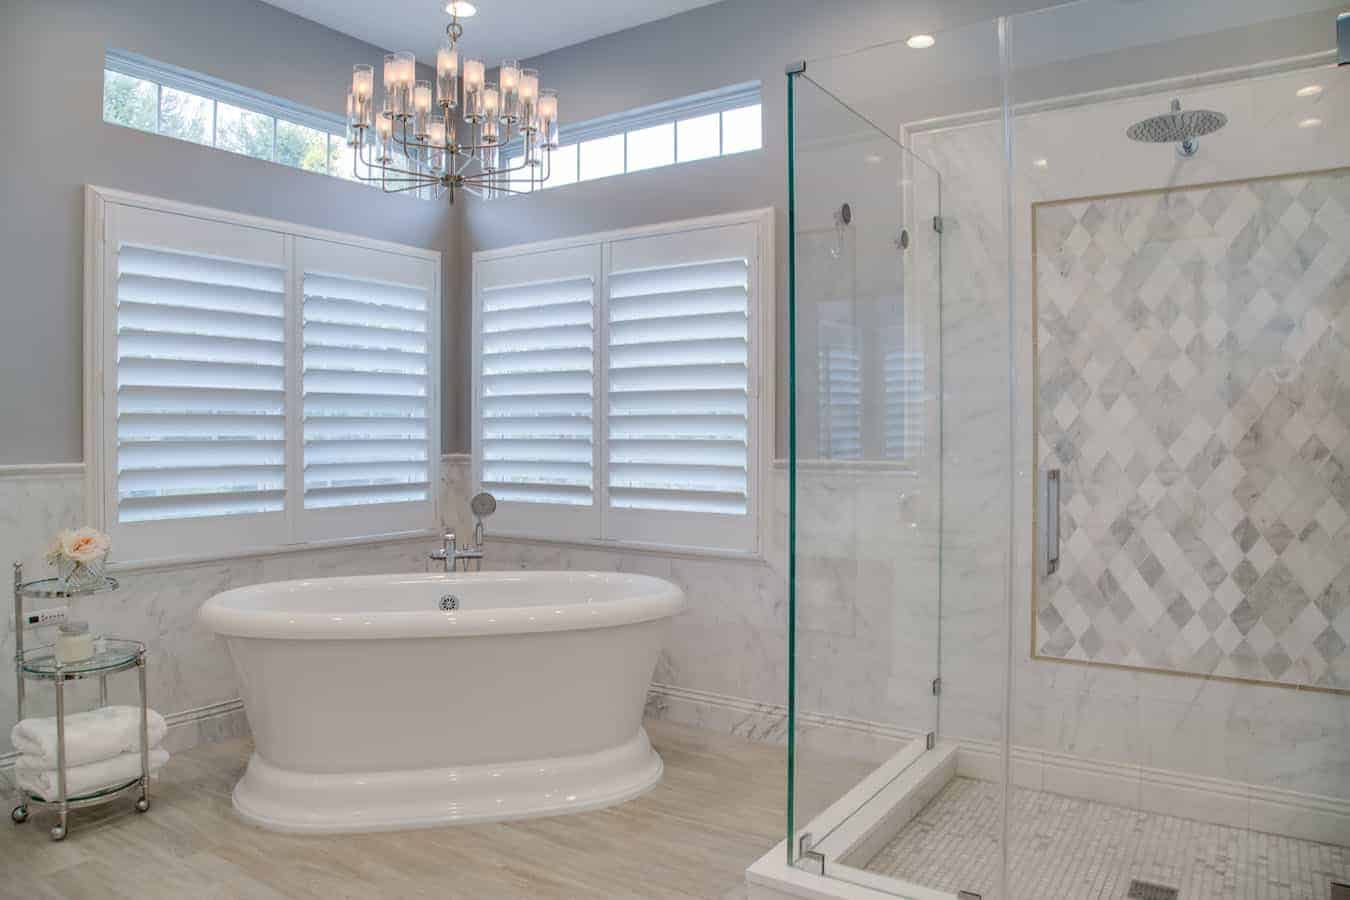 The Villages at Melville Bathroom remodel interior design